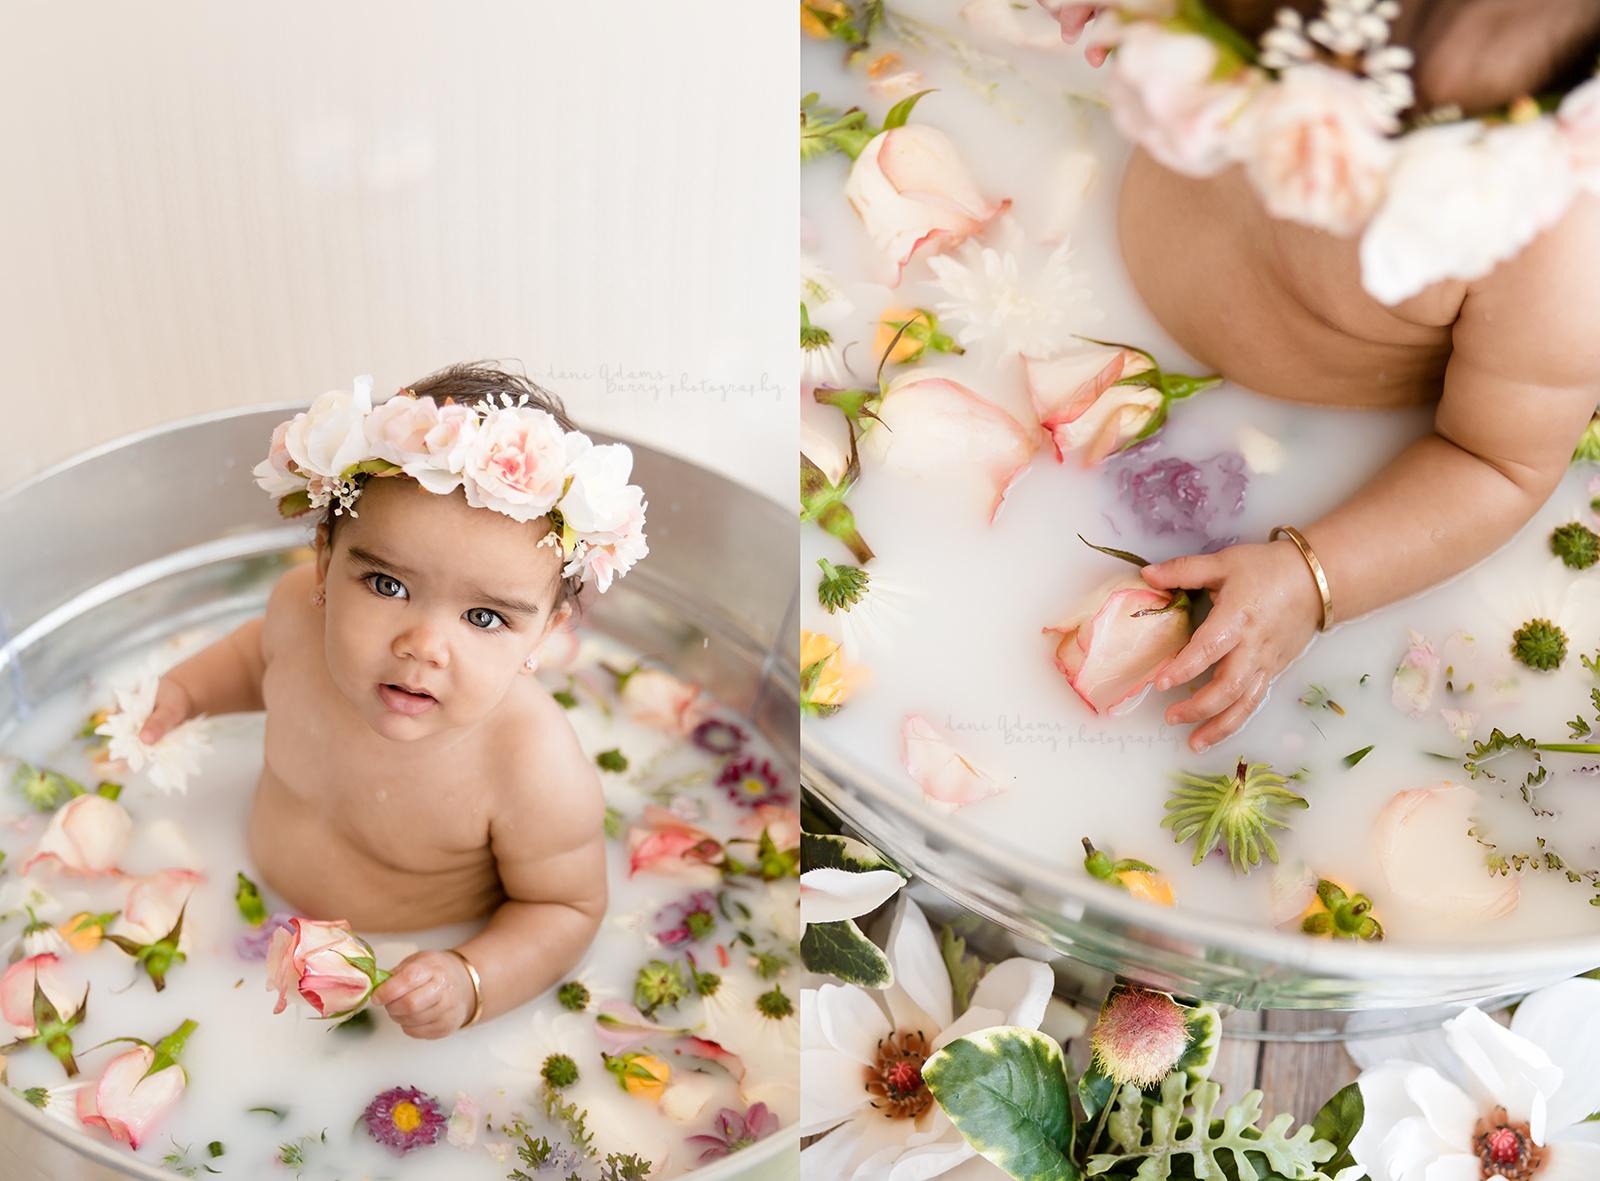 Amazing Baby Milestone Milk Bath Photography You will Want